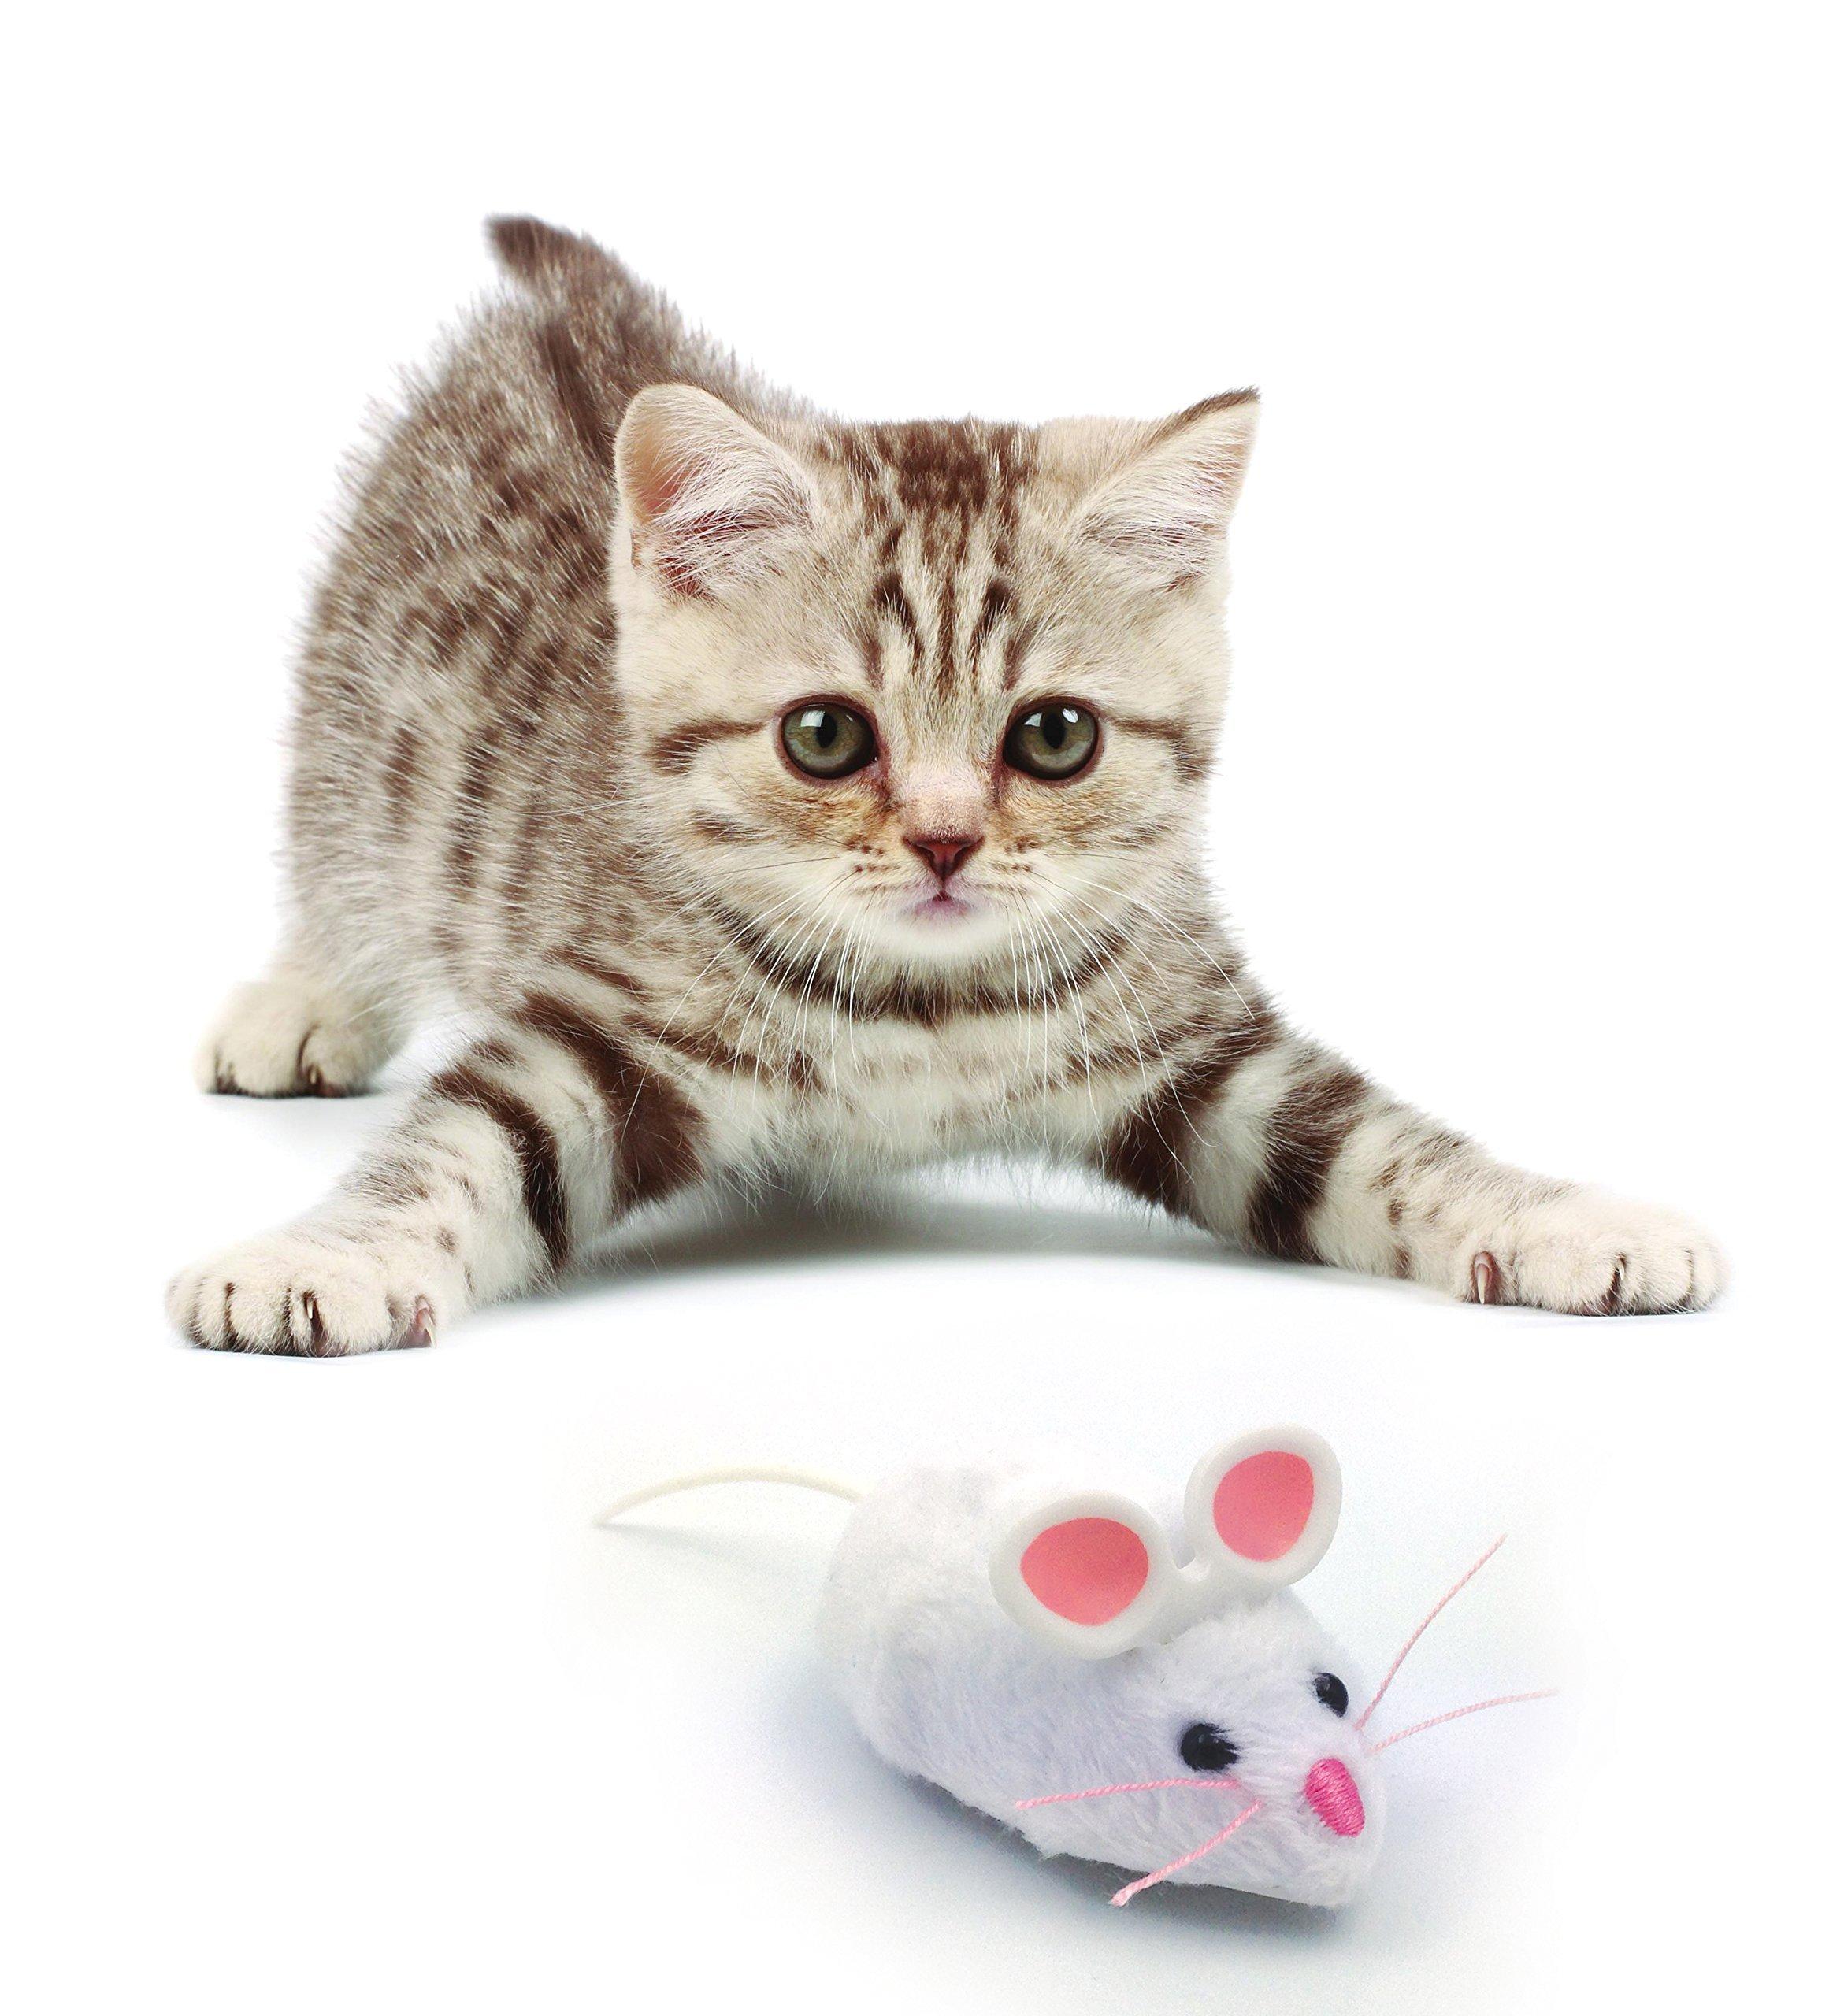 Hexbug Mouse Robotic Cat Toy - Random Color by HEXBUG (Image #3)